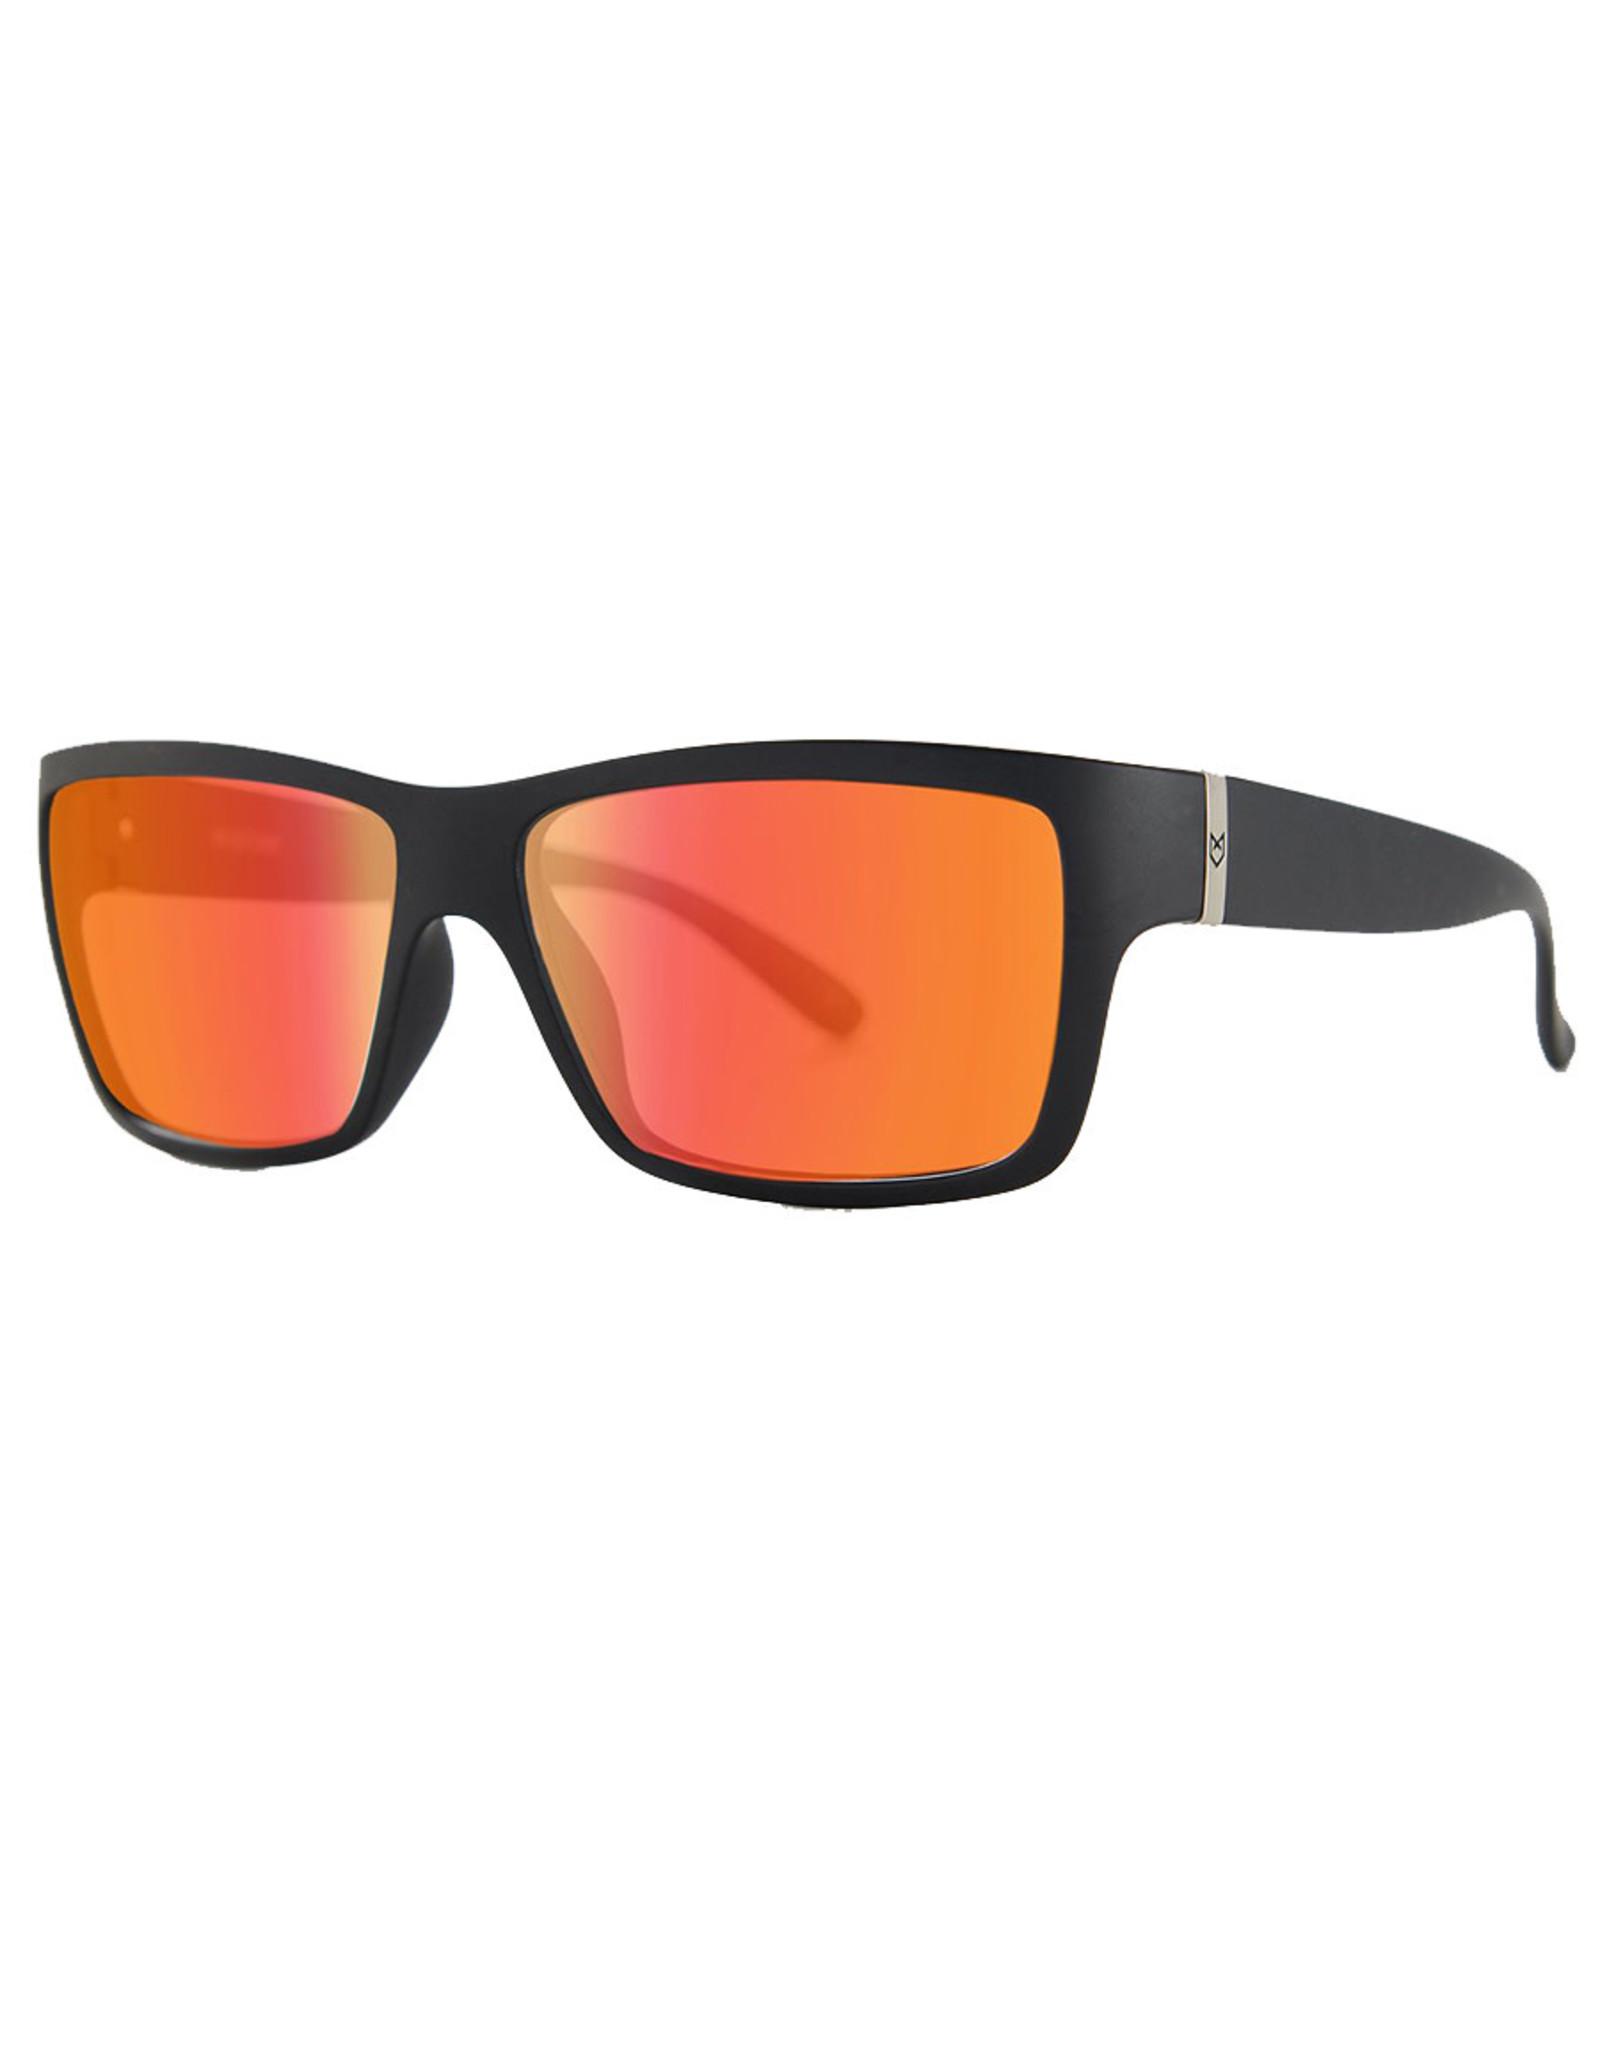 Madson Madson Sunglasses Piston (Black Matte/Fire Chrome Polarized Lens)